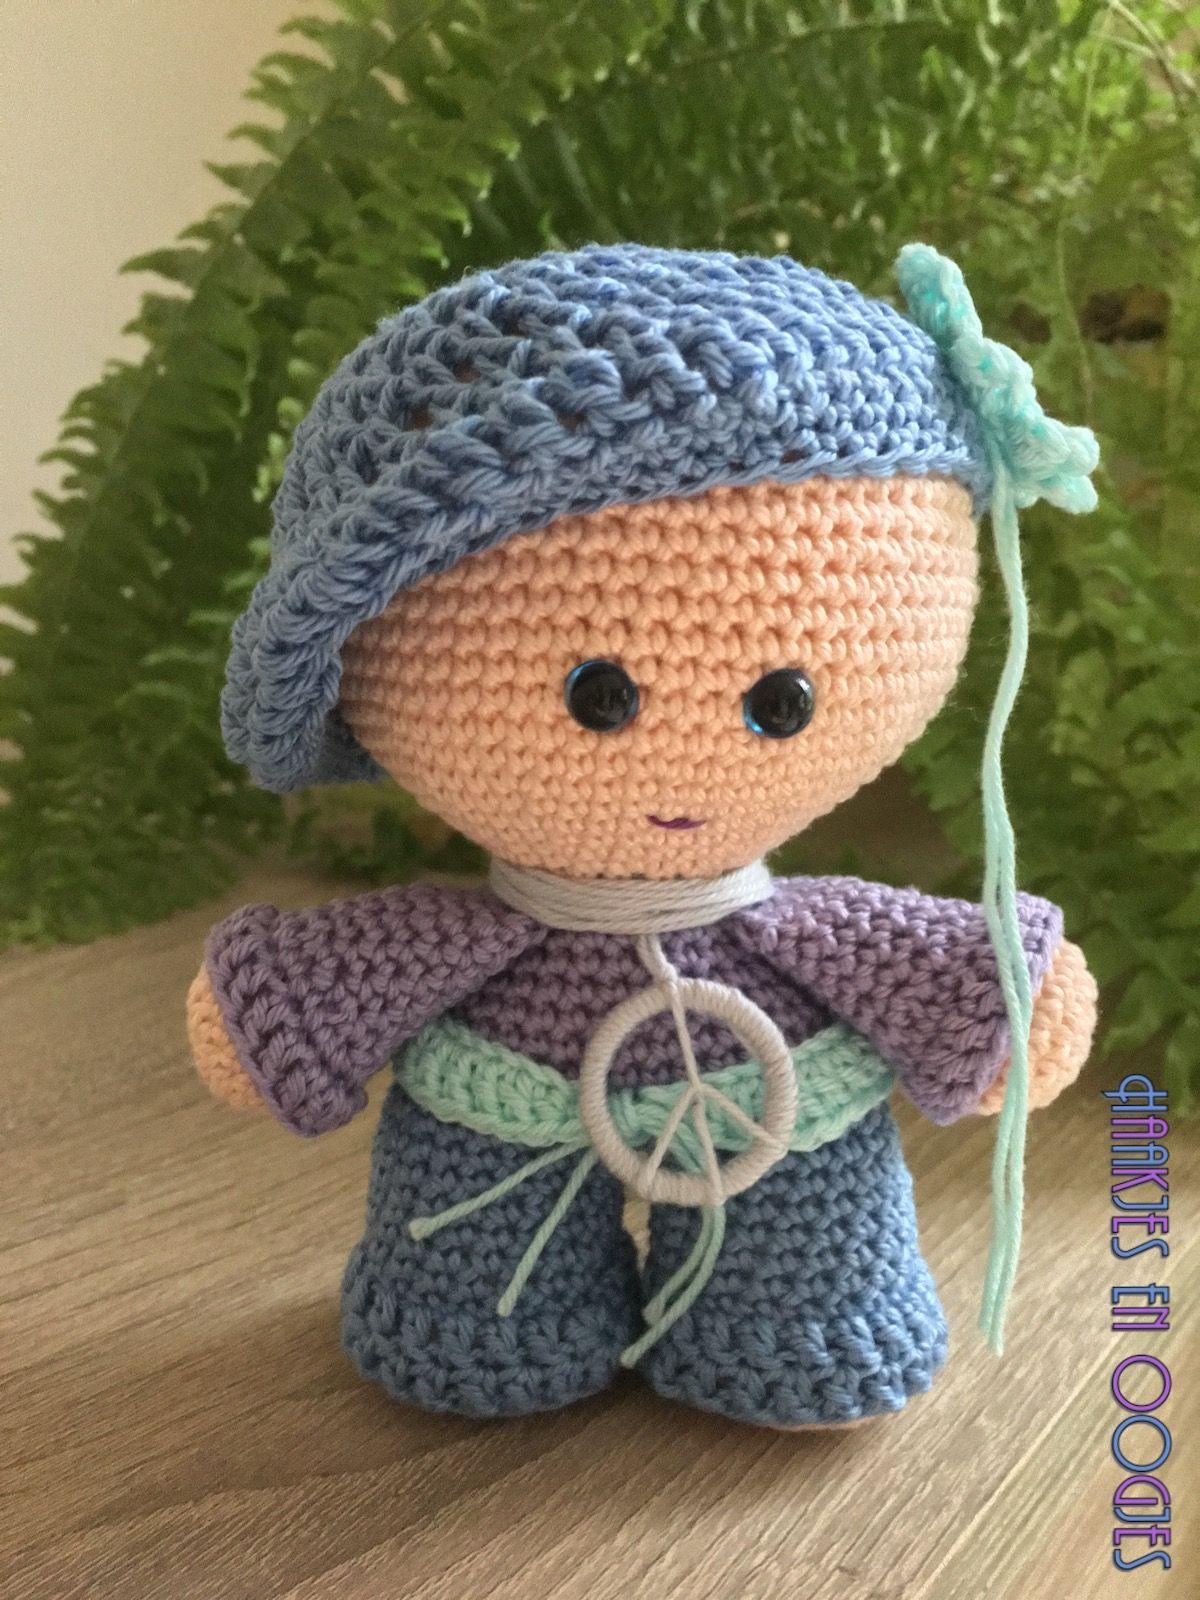 Big head doll Hippie Yasmijn haken flower power